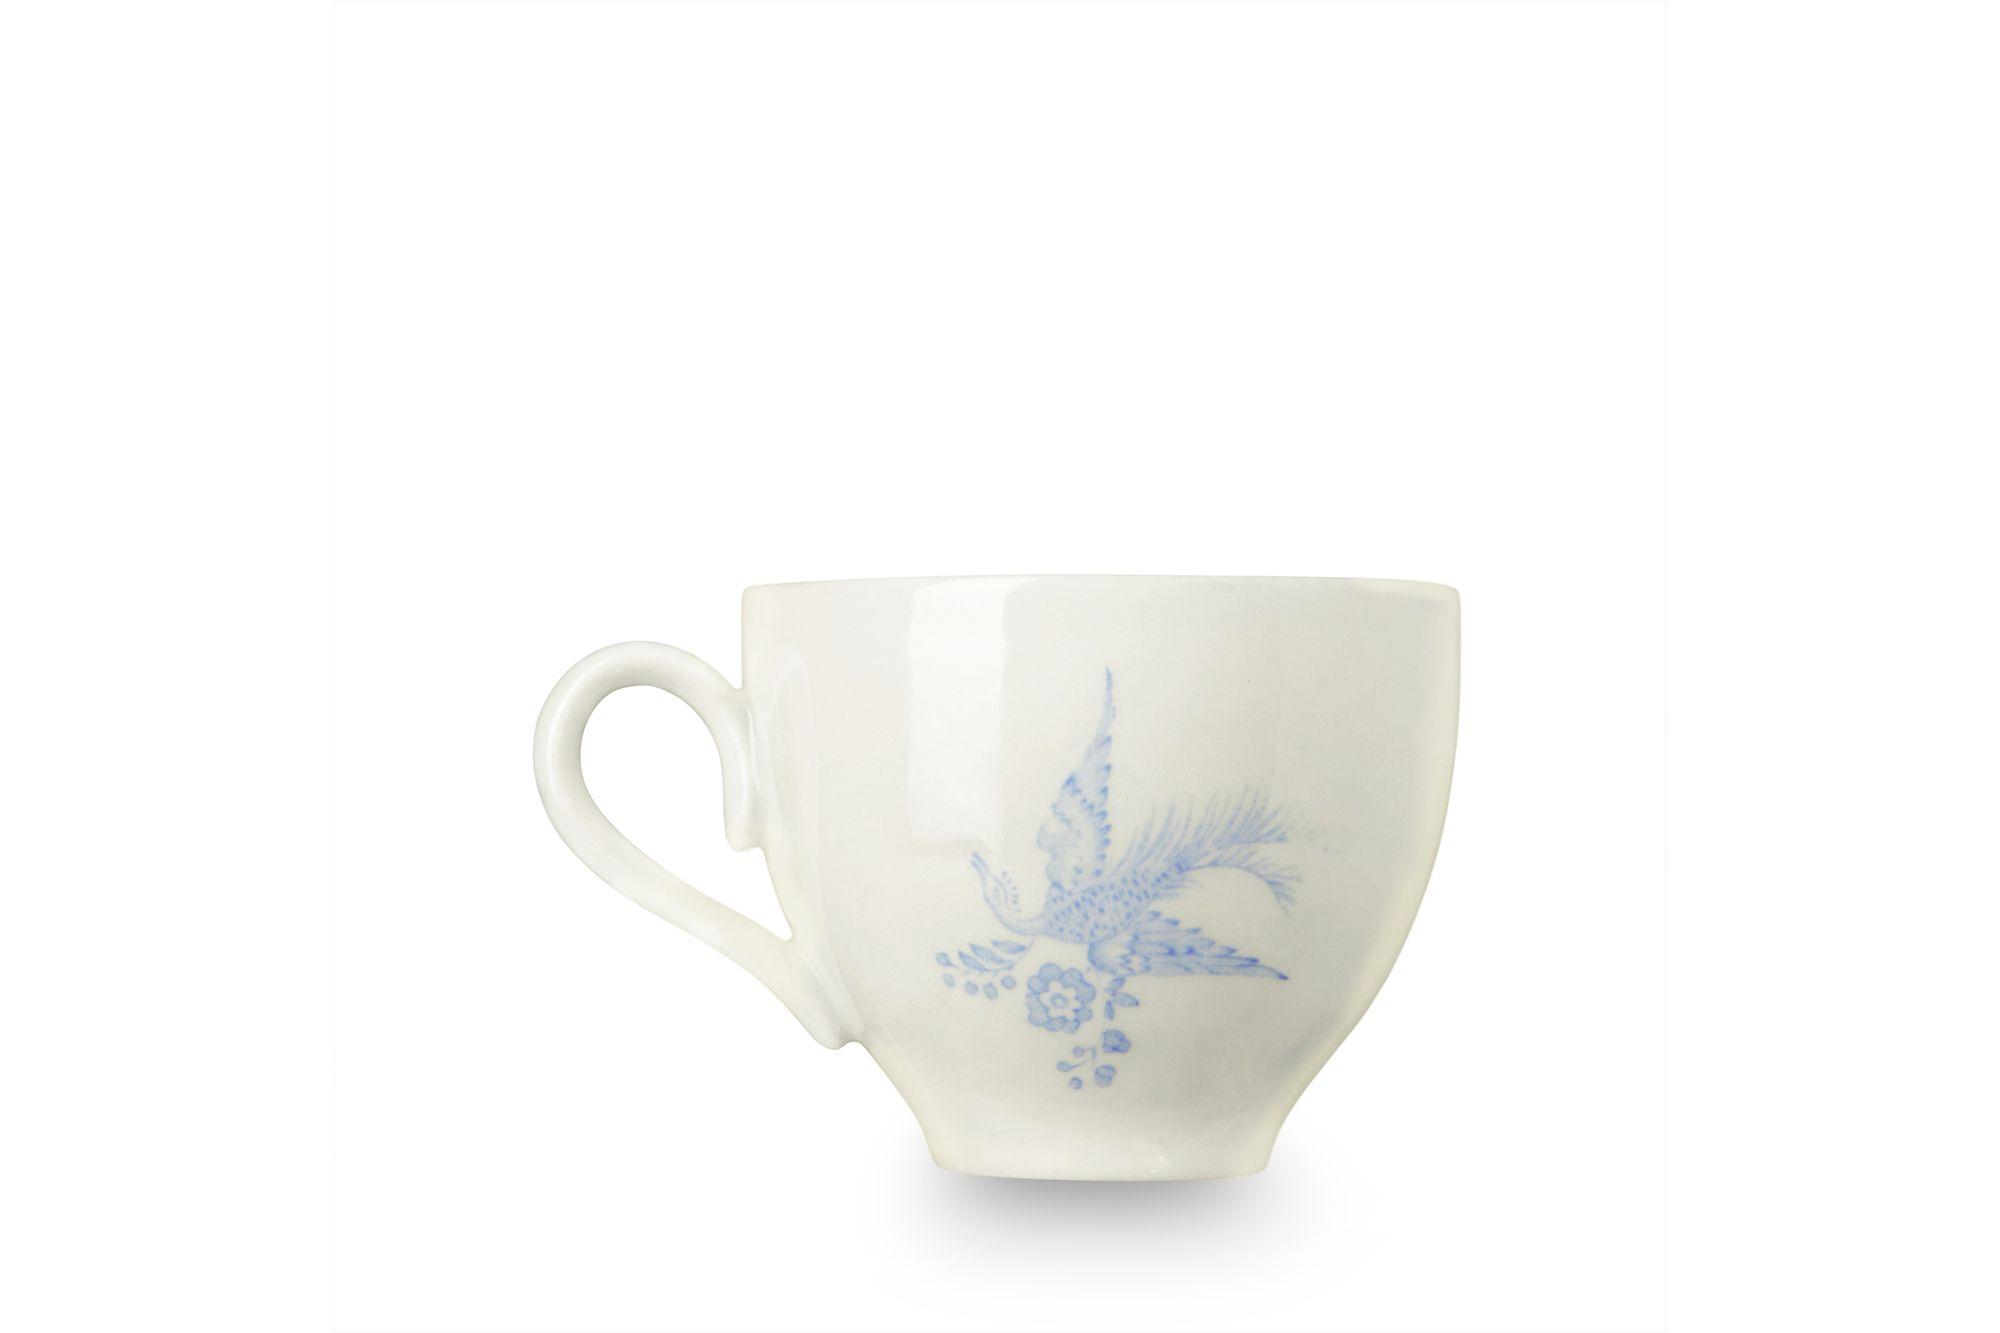 "Burleigh Blue Asiatic Pheasants Teacup 3 1/4 x 2 3/4"" thumb 2"